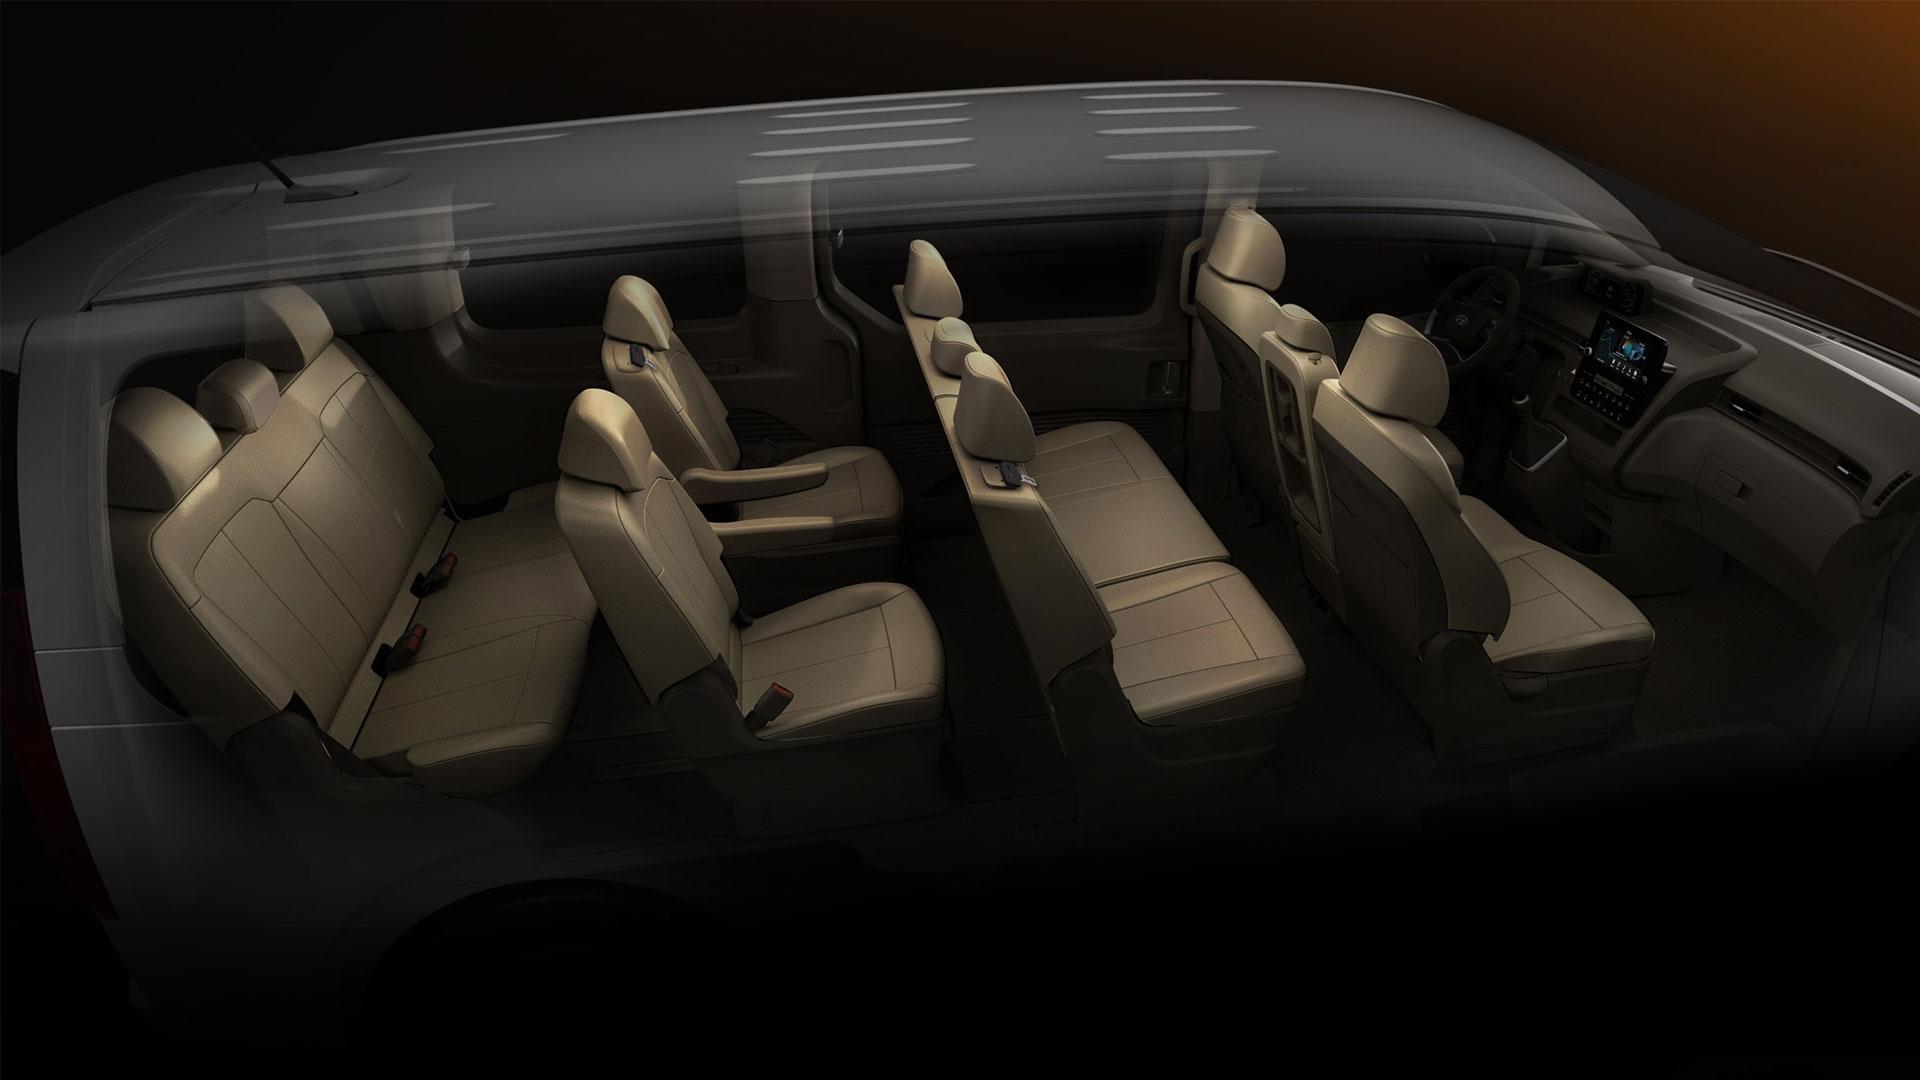 The Hyundai Staria default passenger setting